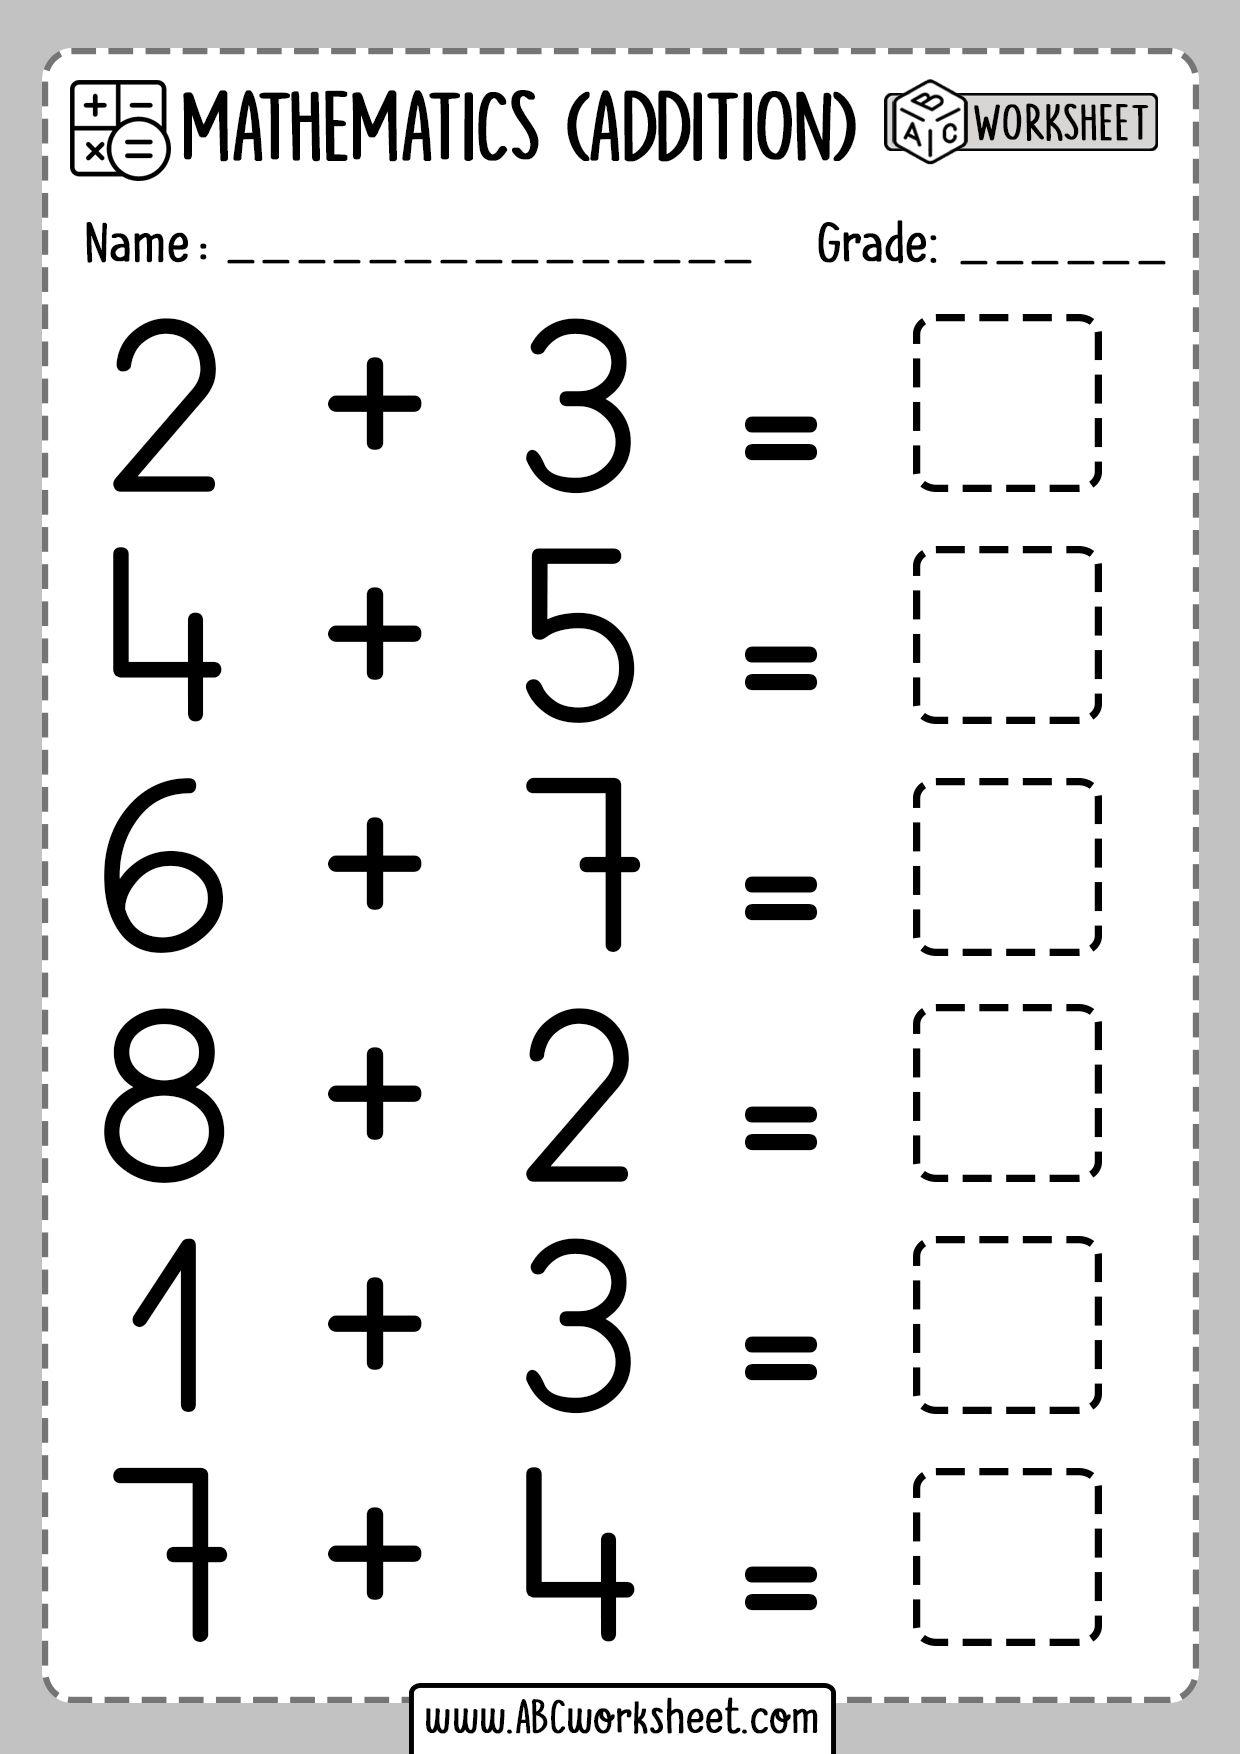 Addition Worksheets For Grade 1 In